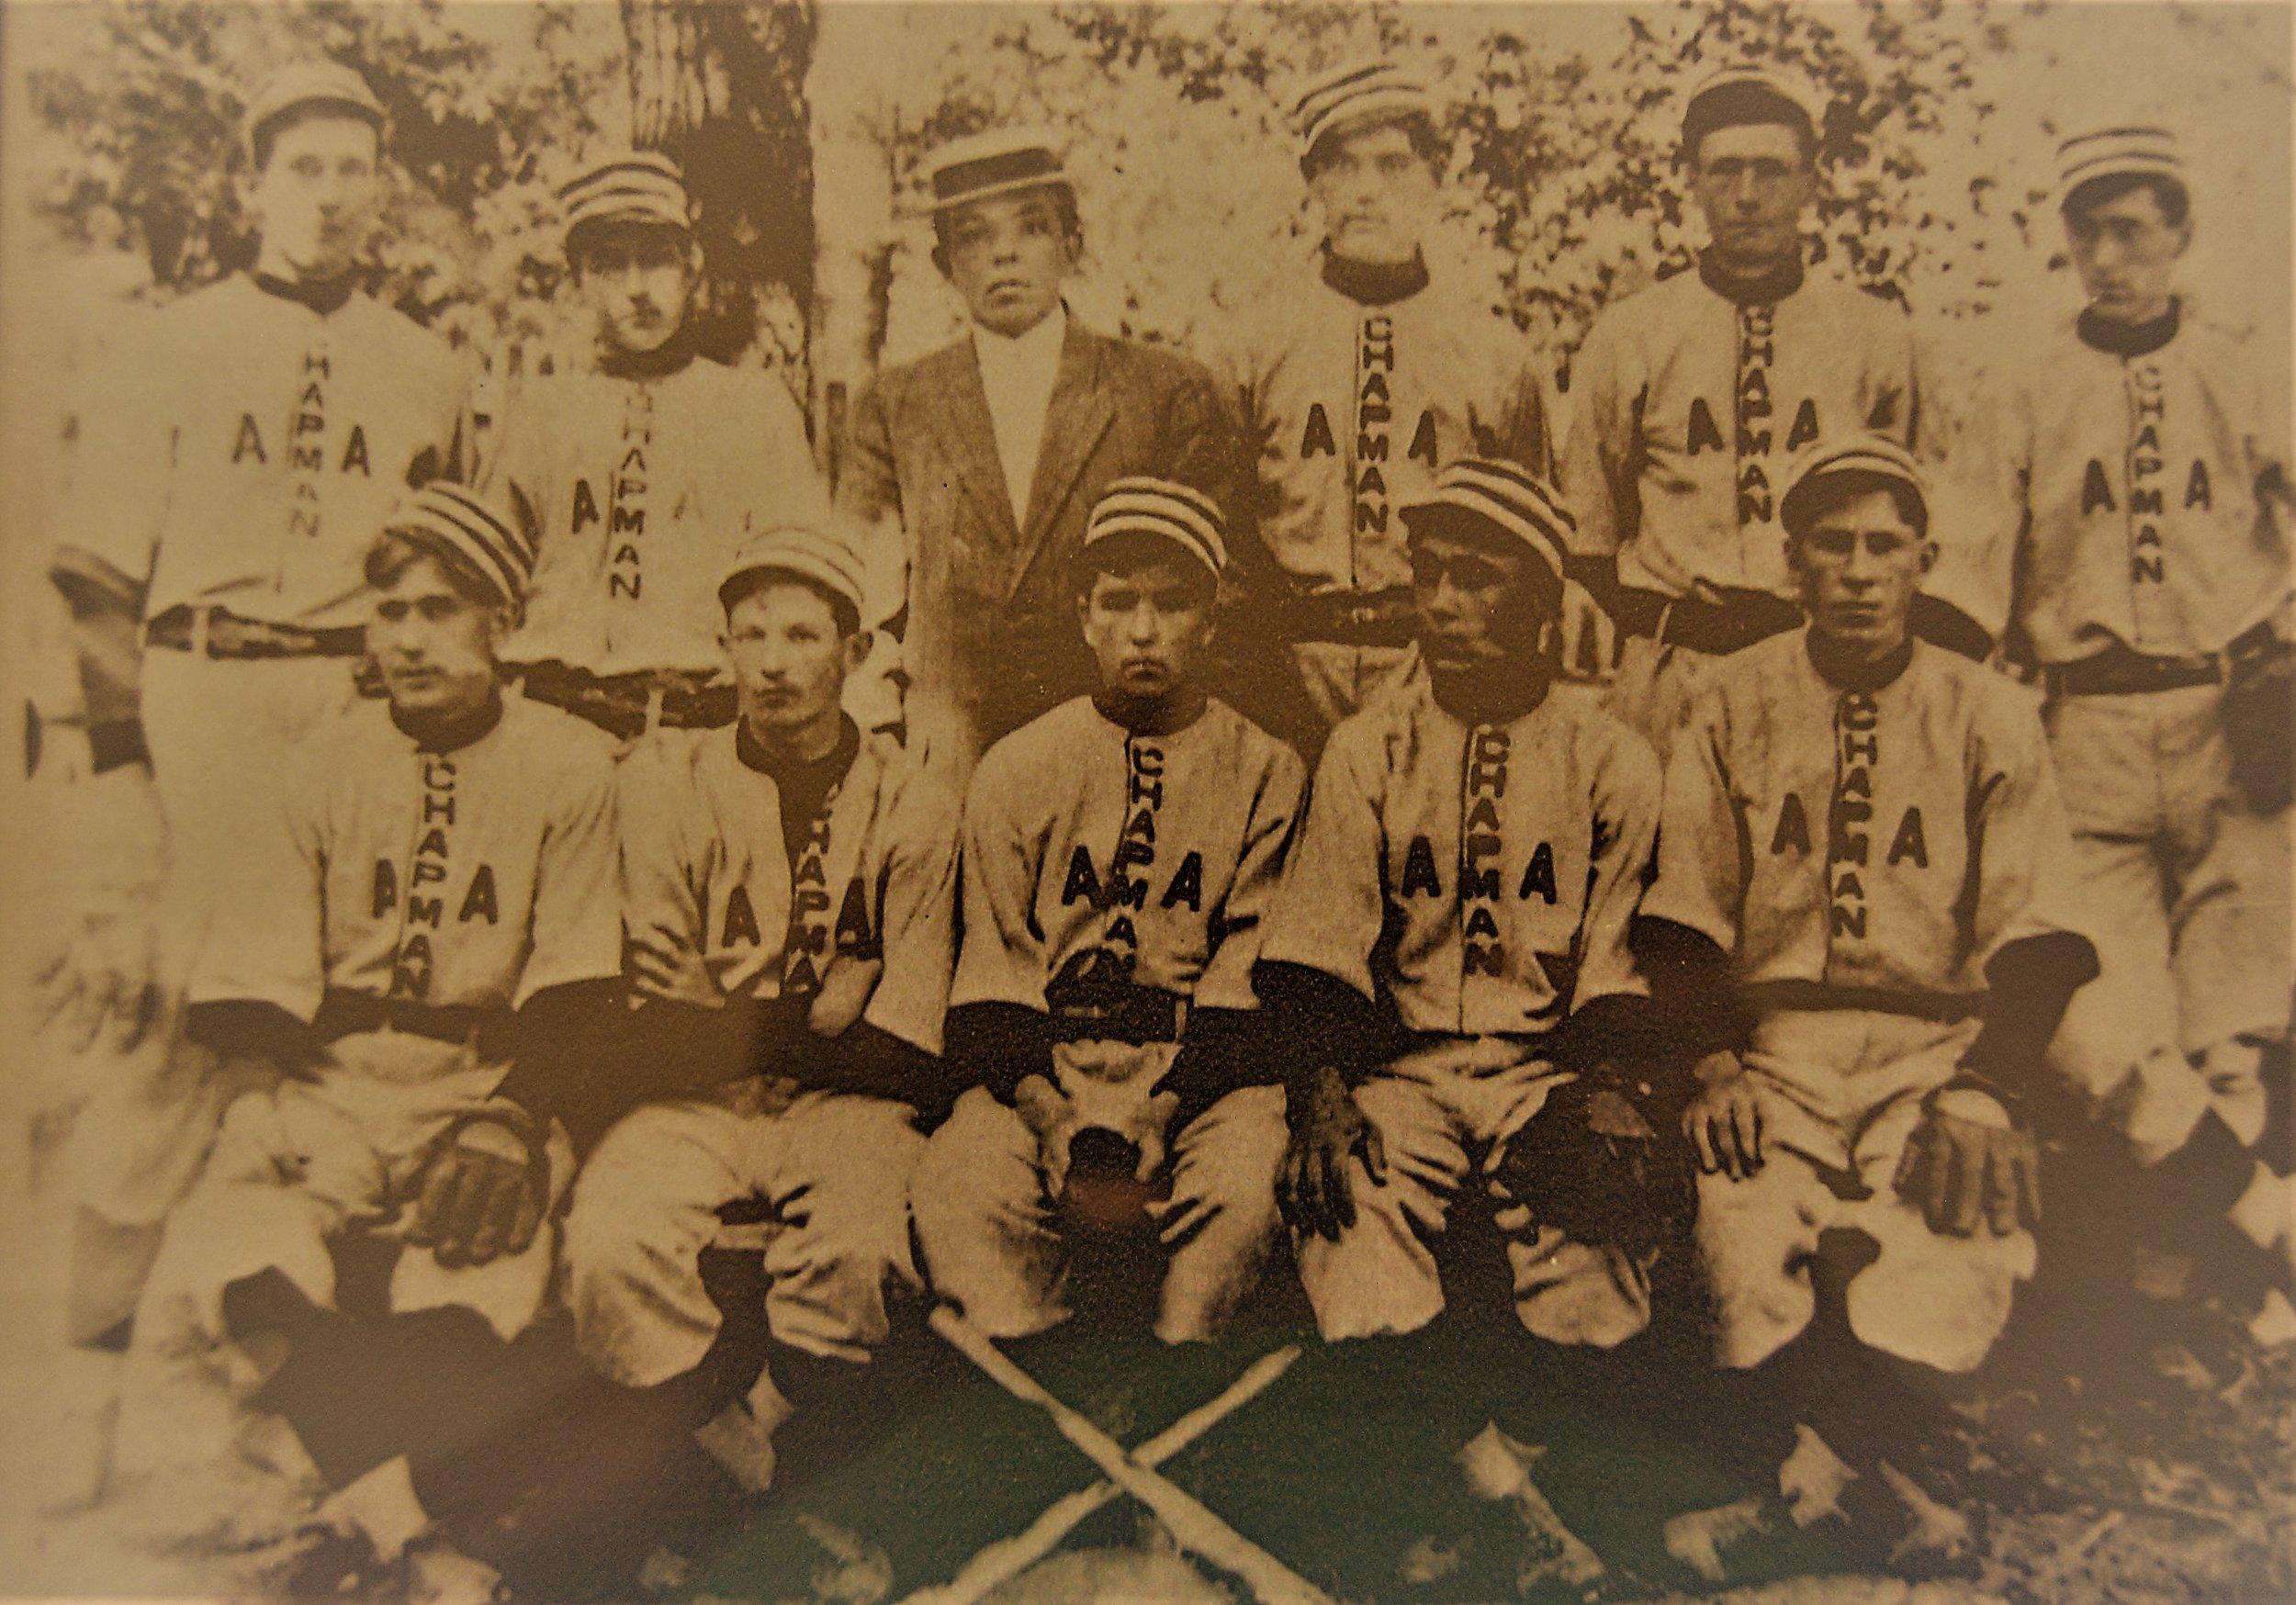 - Chapman Baseball Team circa early 1900s